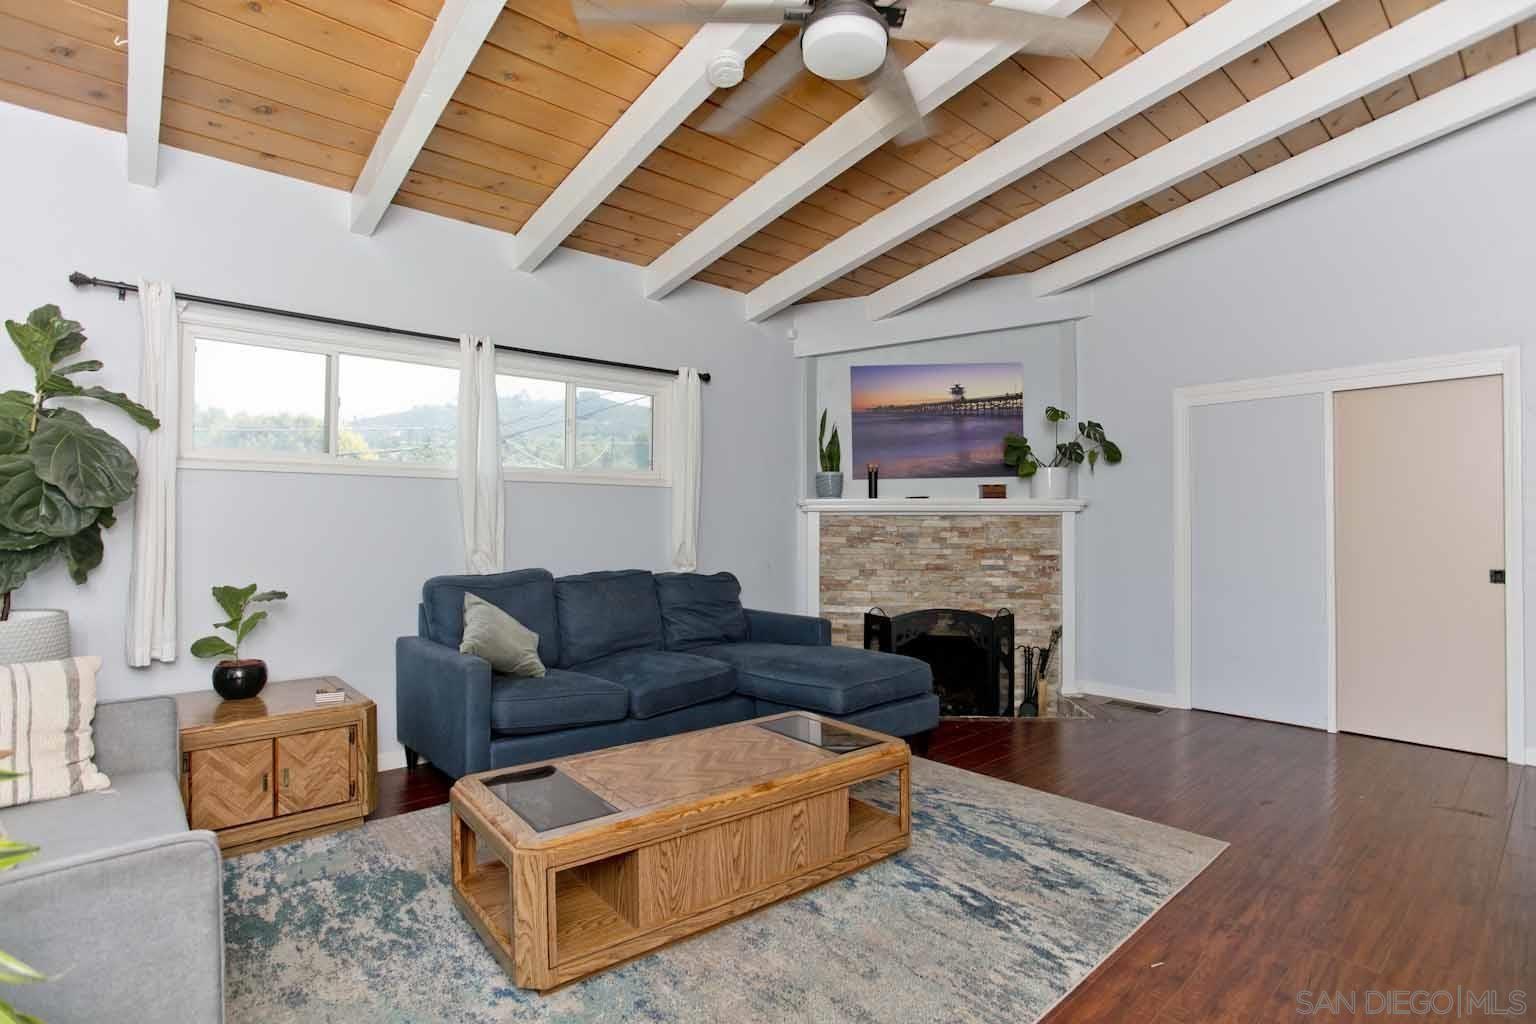 Photo of 8872 Golden Ridge Rd, Lakeside, CA 92040 (MLS # 210026578)